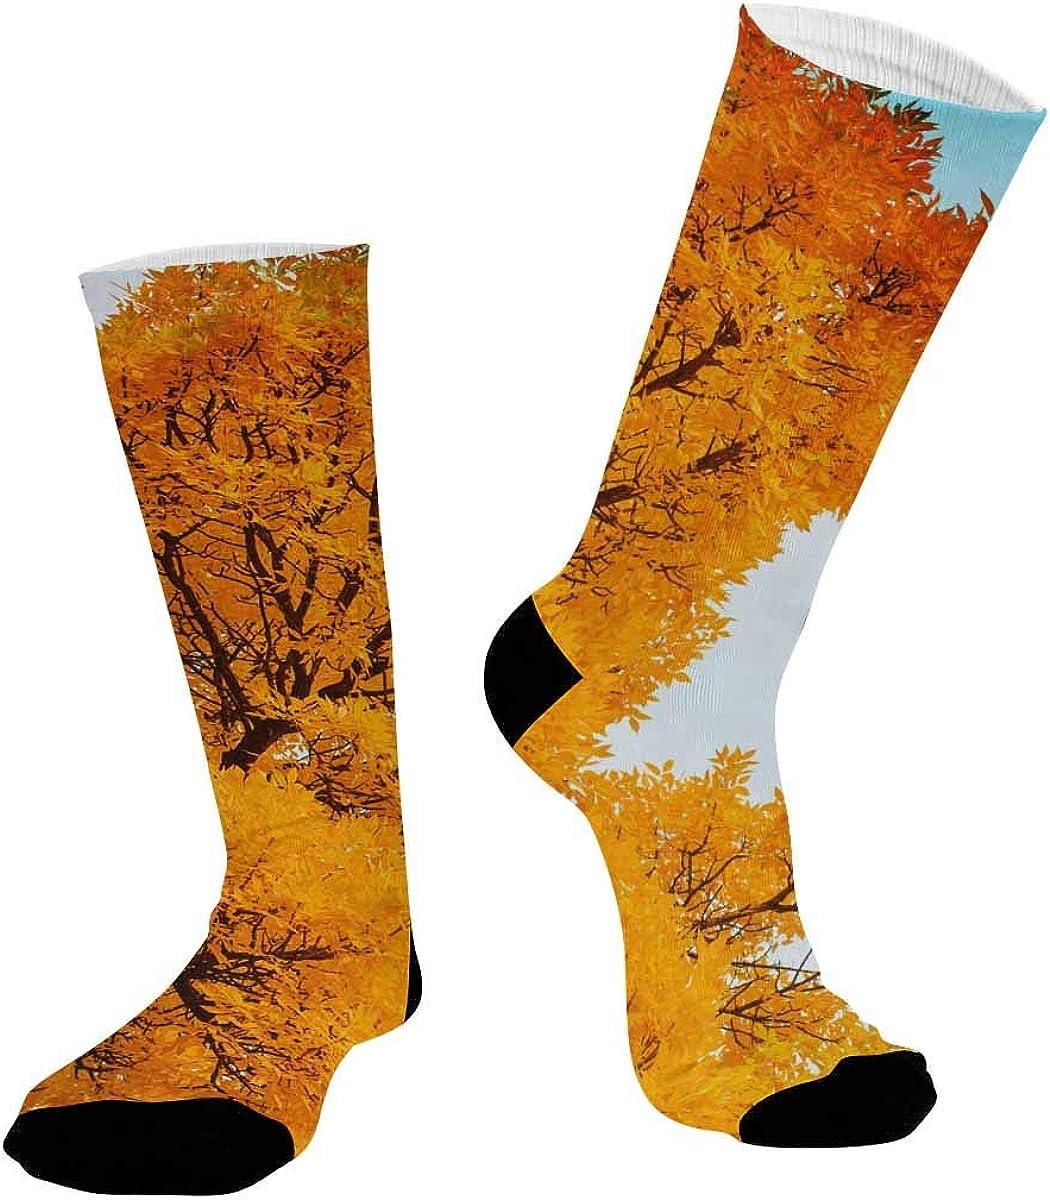 INTERESTPRINT Sublimated Crew Socks, Athletic Dress Socks Colorful Foliage Autumn